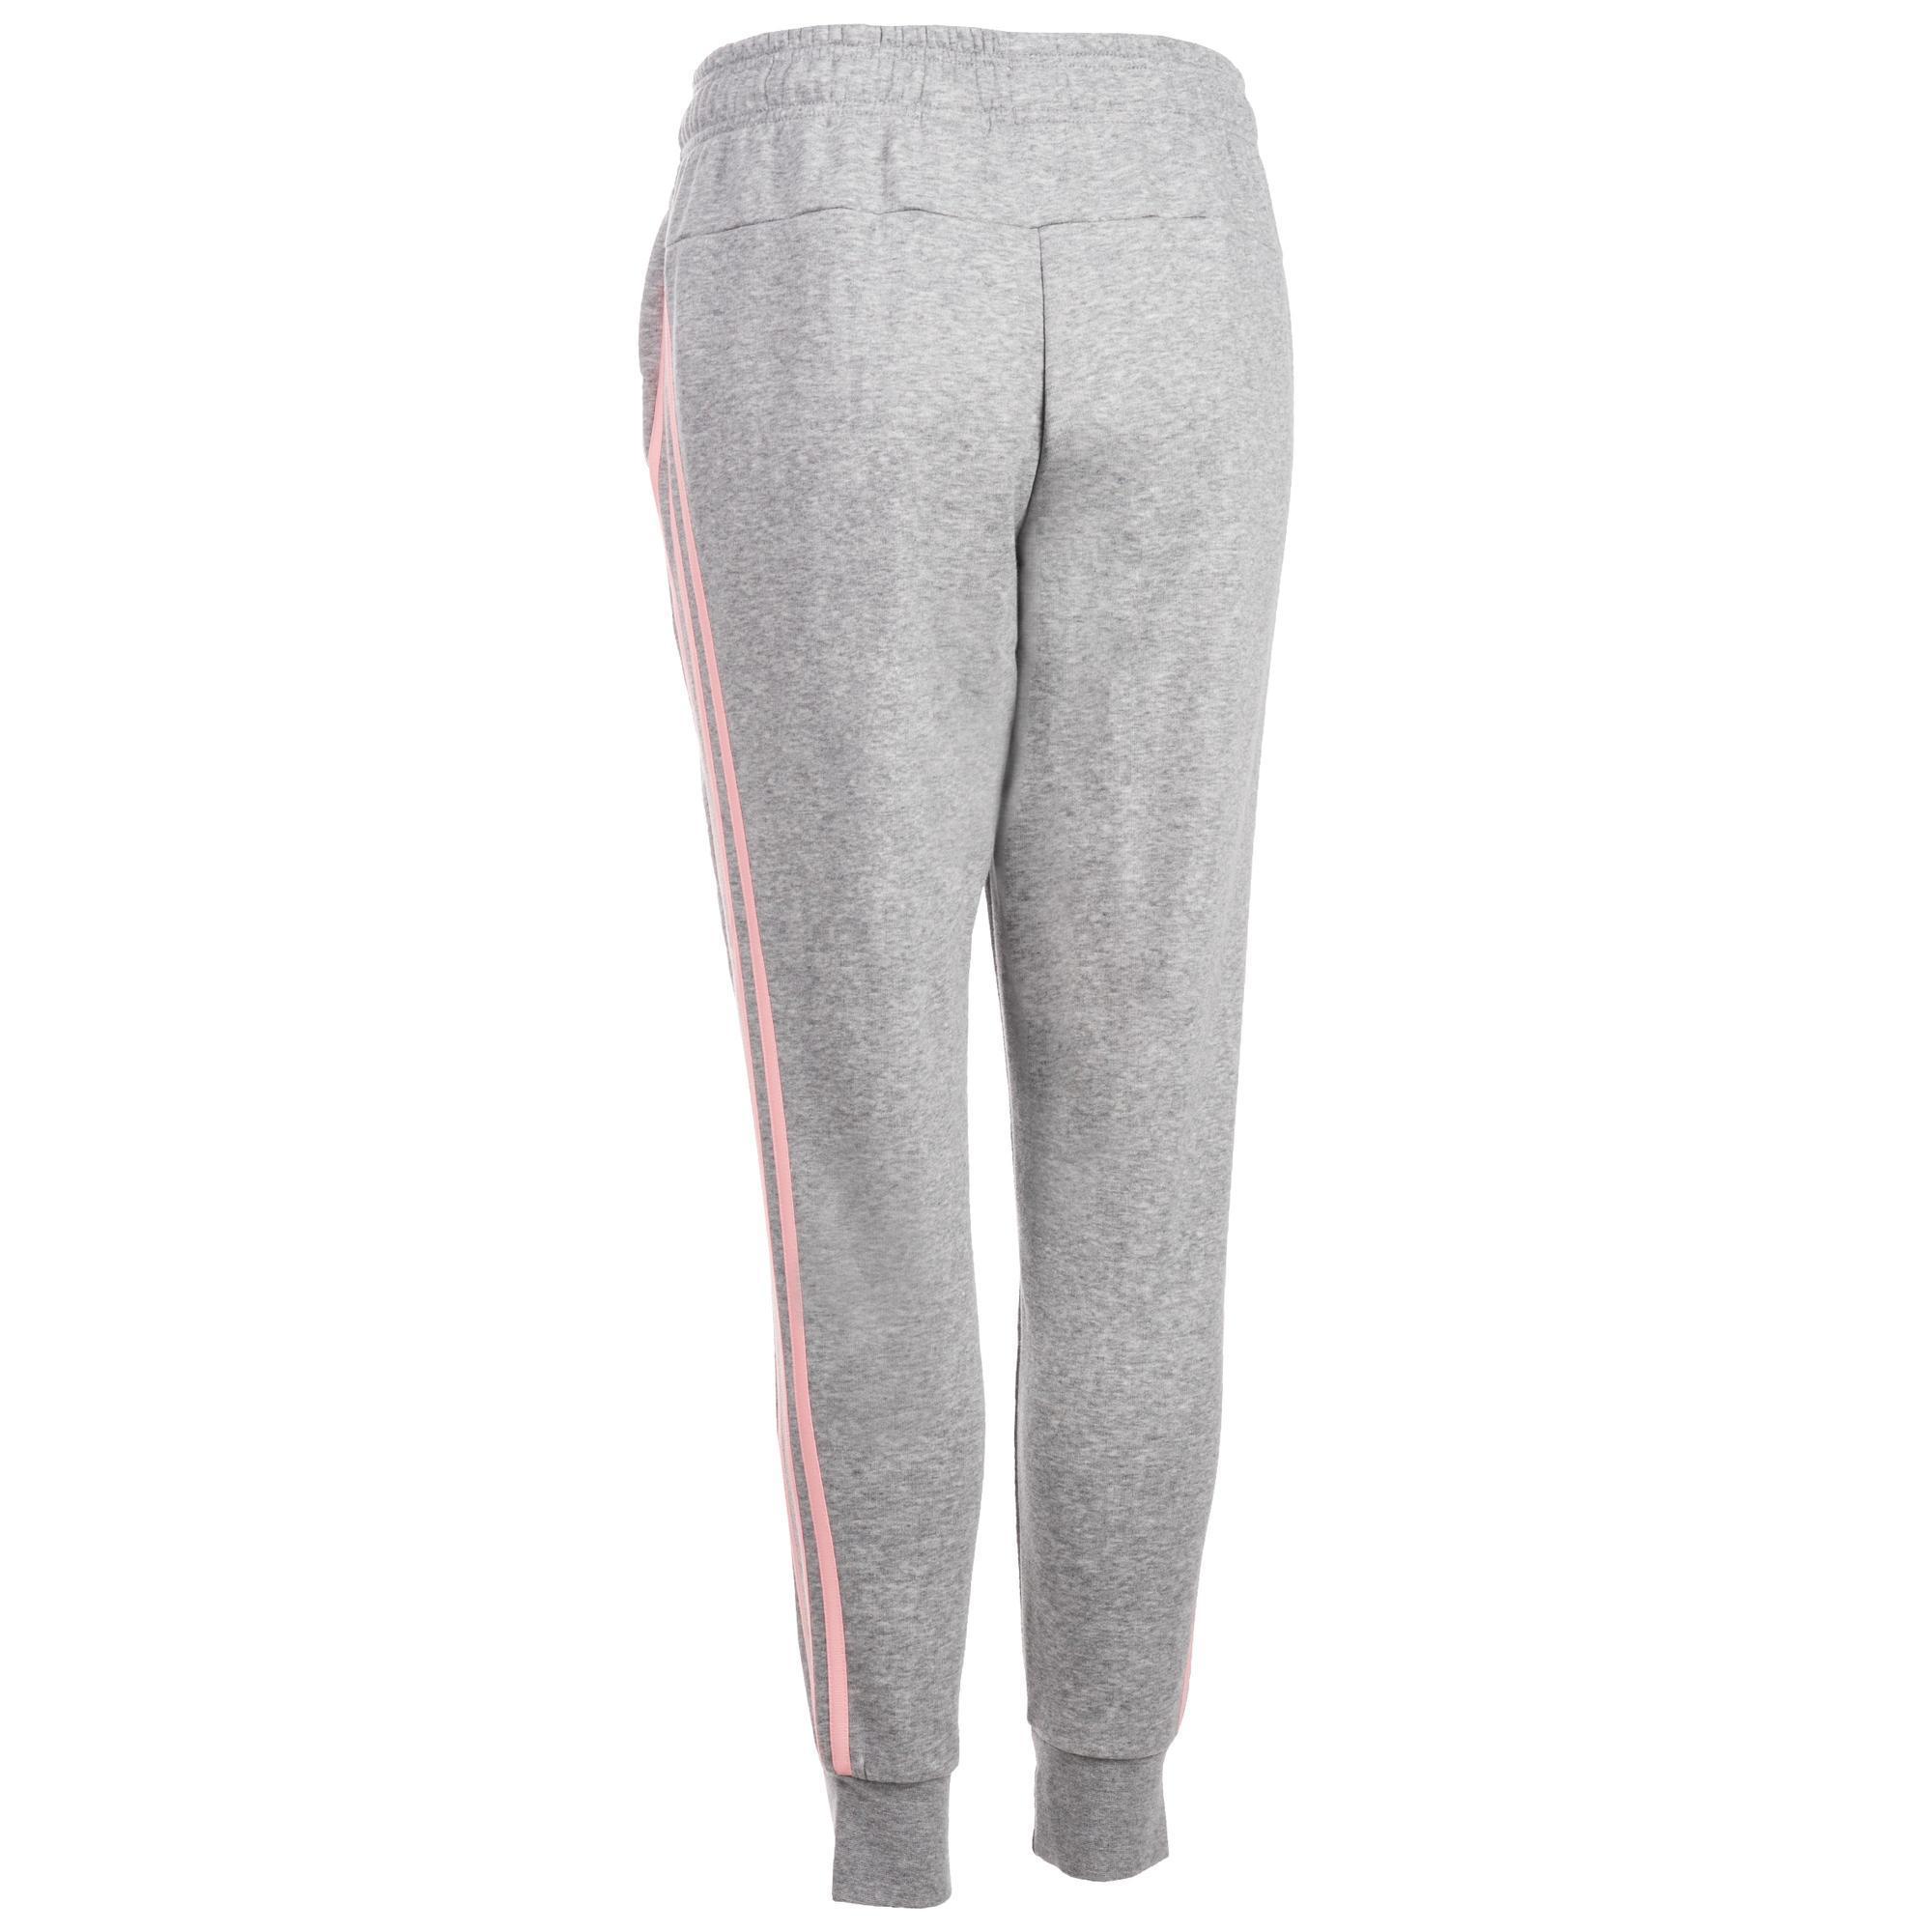 Slim Pantalón 500 Gris Adidas Gimnasia Chándal Mujer 3s Pilates nHCwHY7rq ad1f7a842c4f